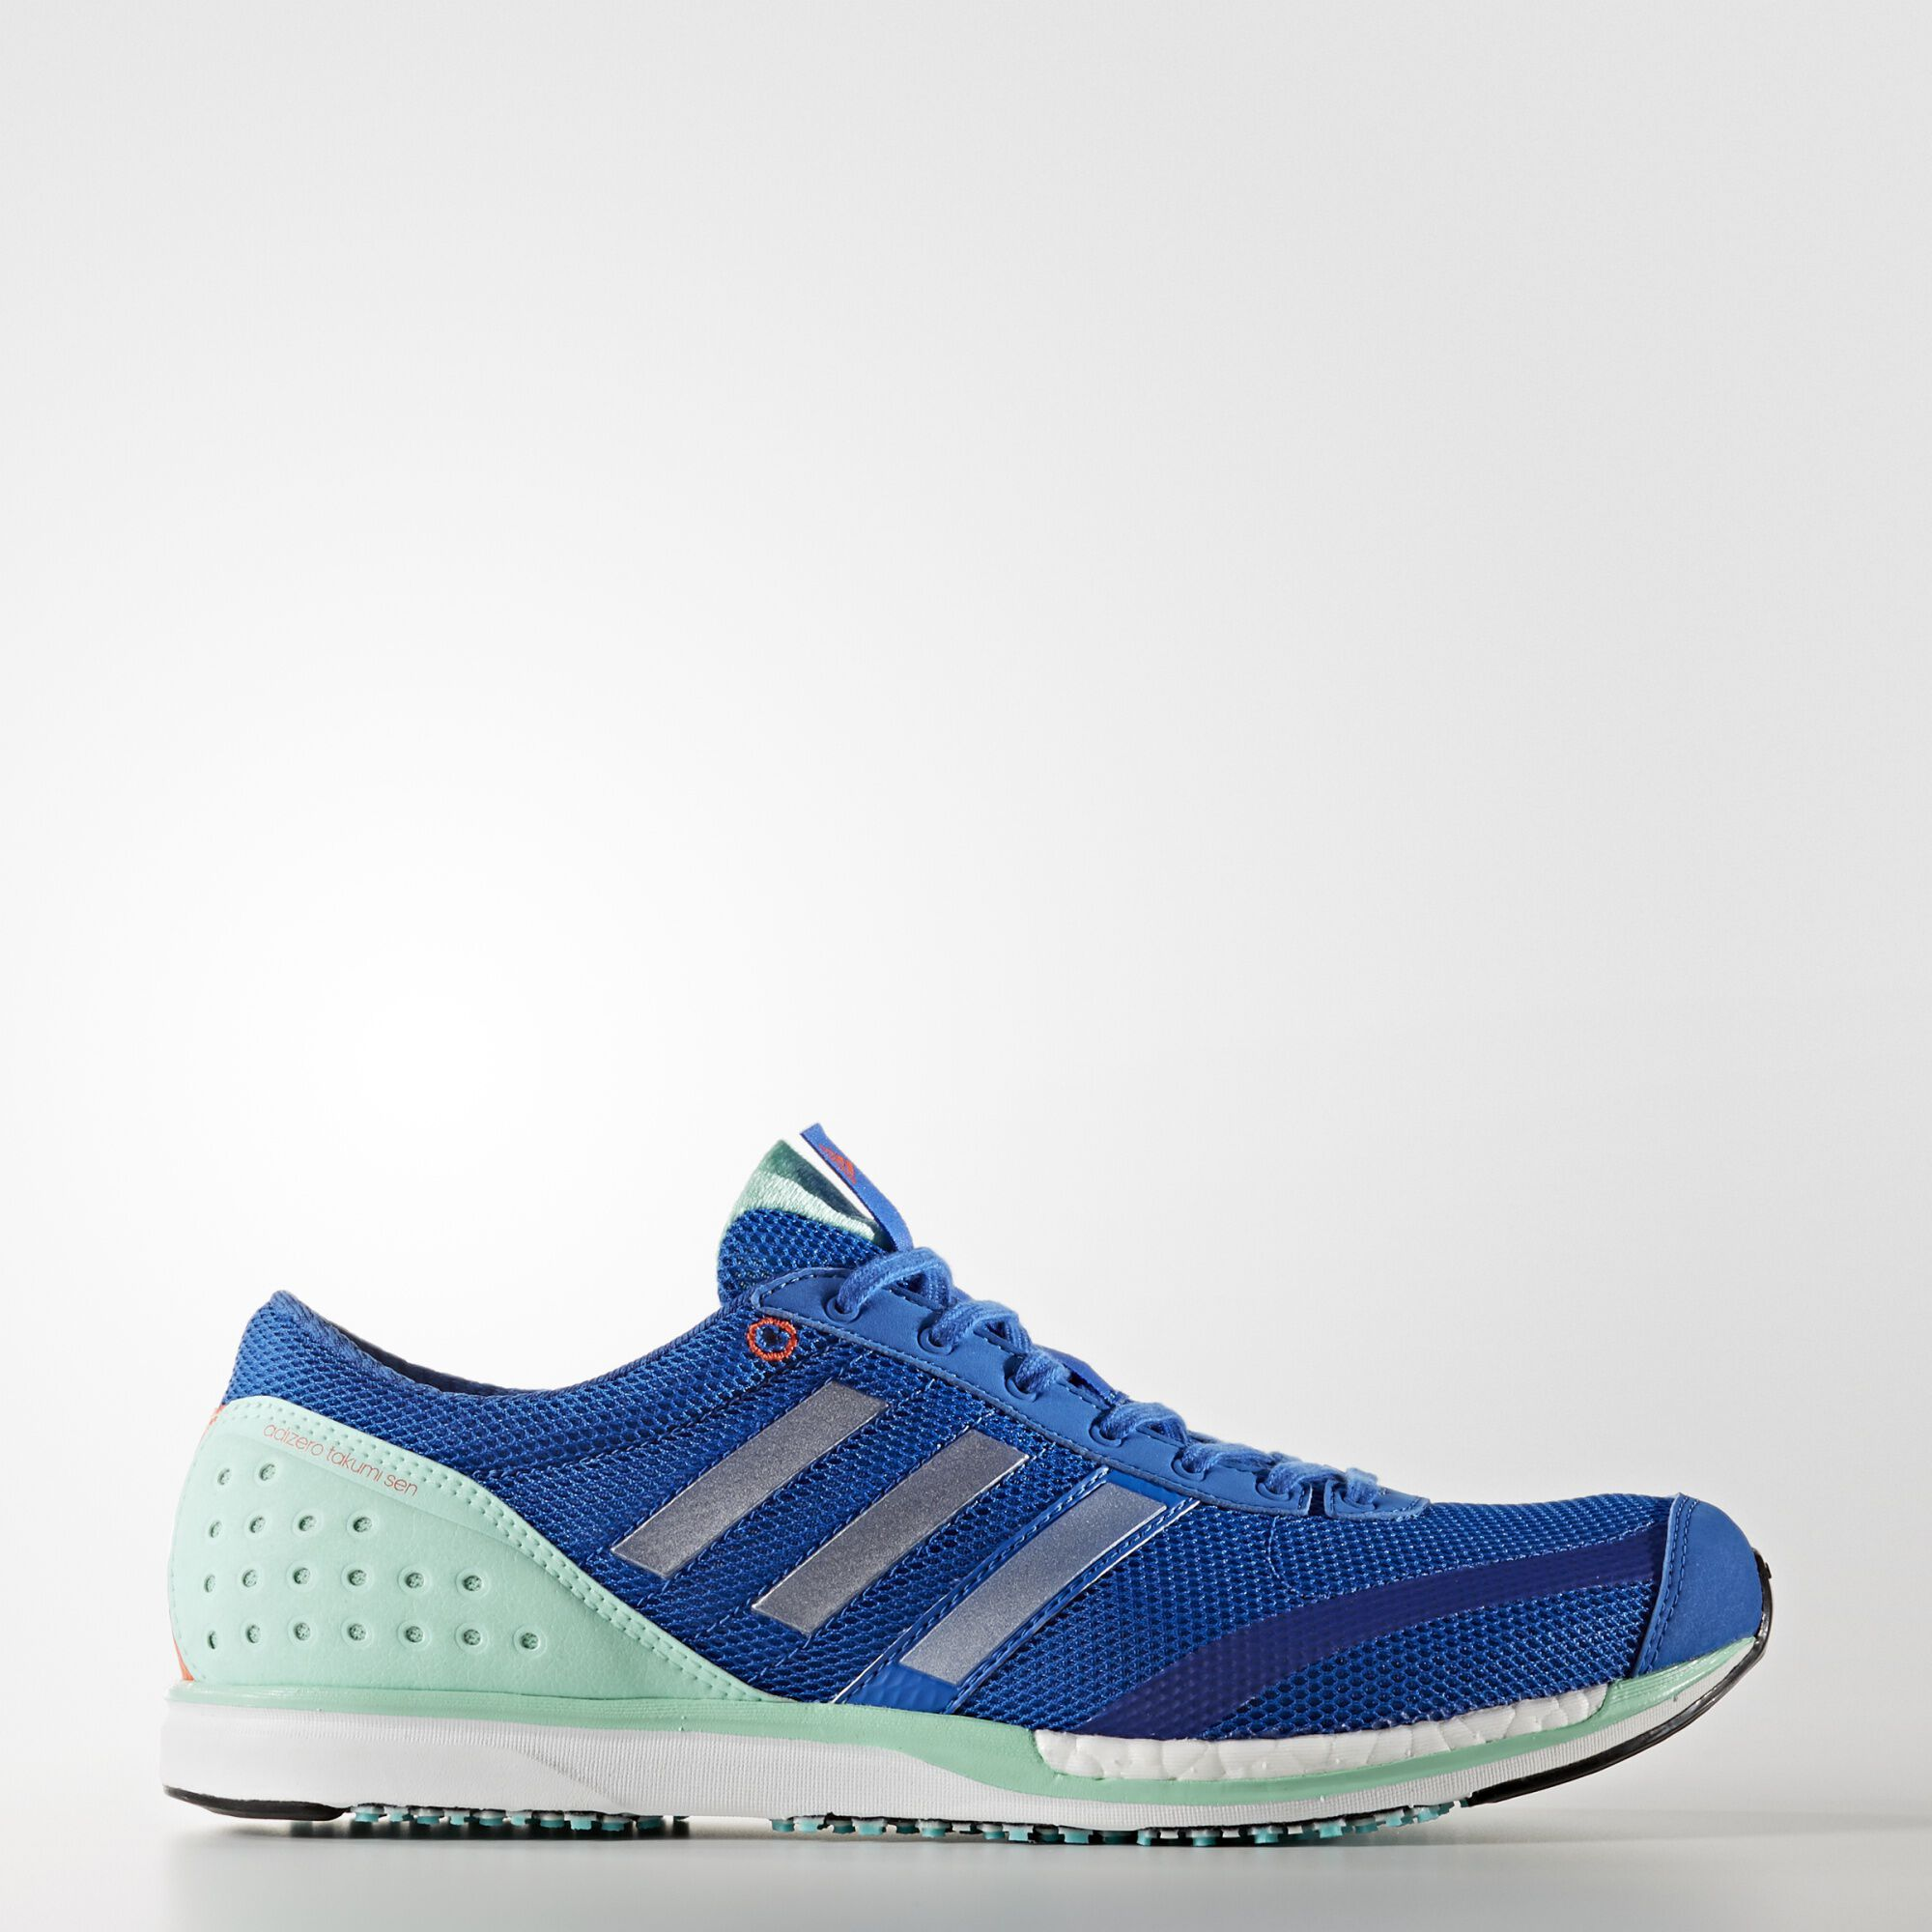 Adidas Shoes Adizero